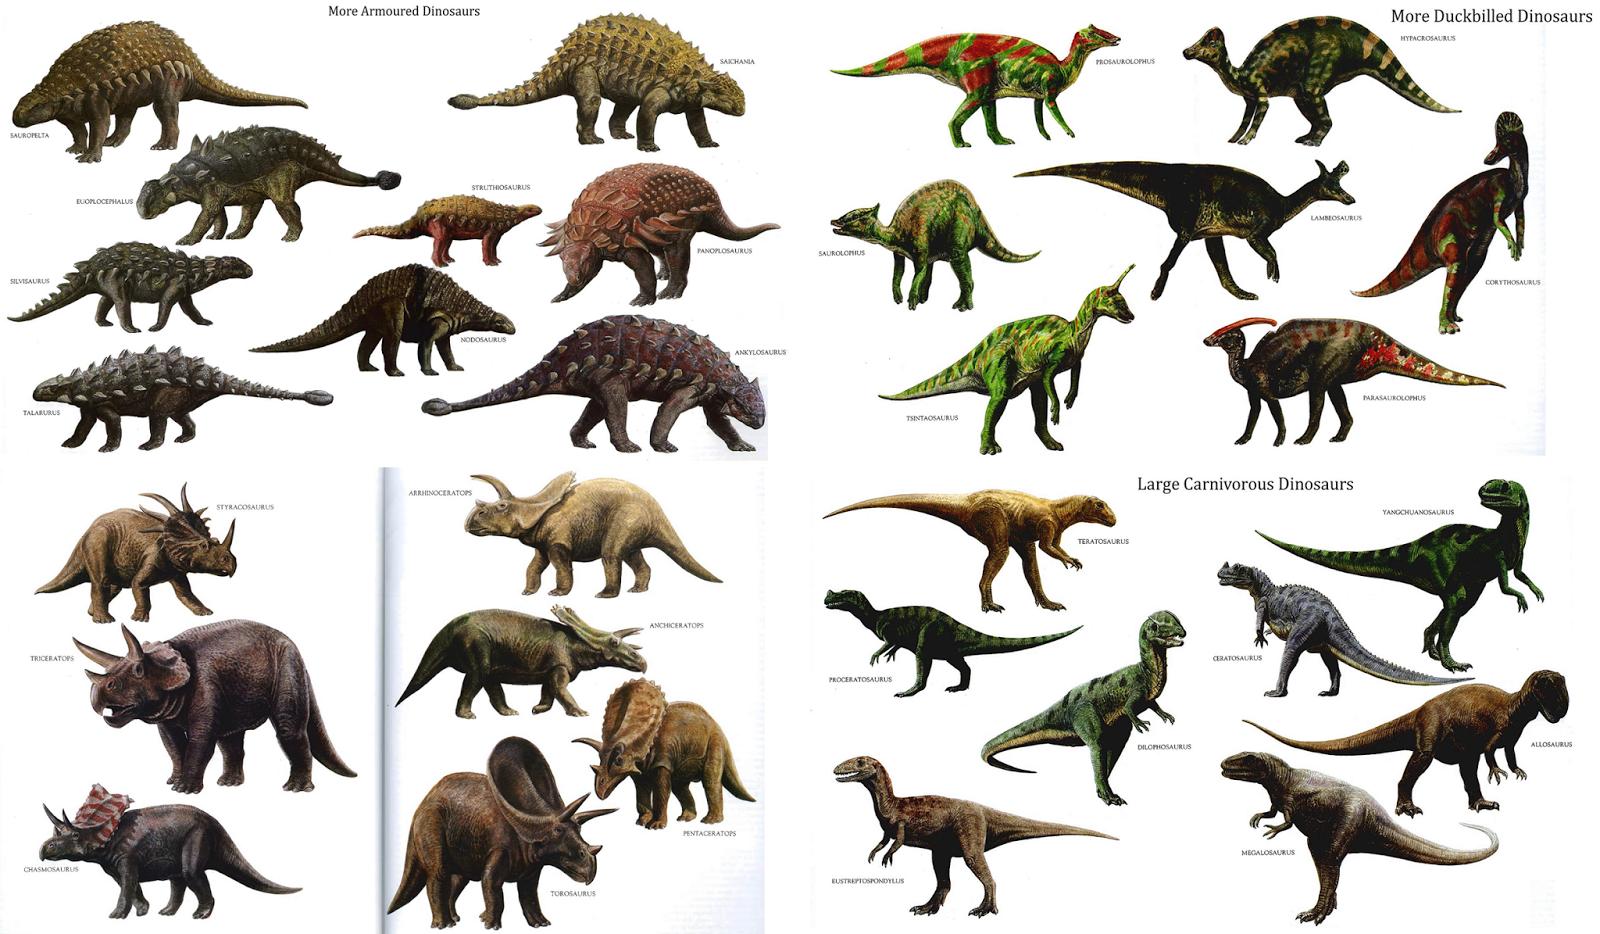 Different Dinosuars